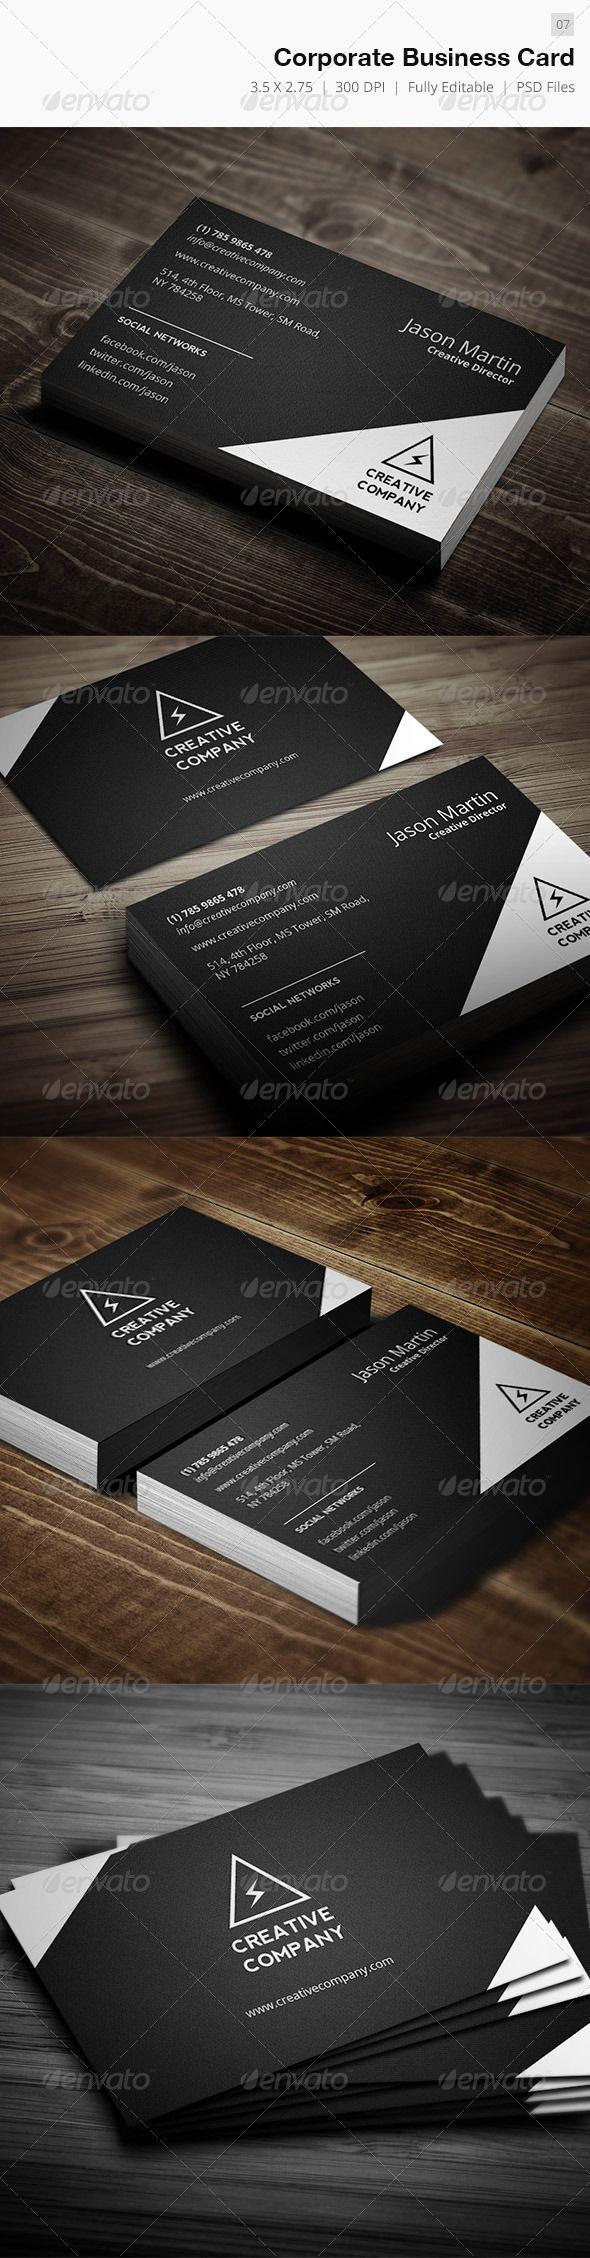 Corporate Business Card 07 Corporate Business Card Business Cards Business Card Design